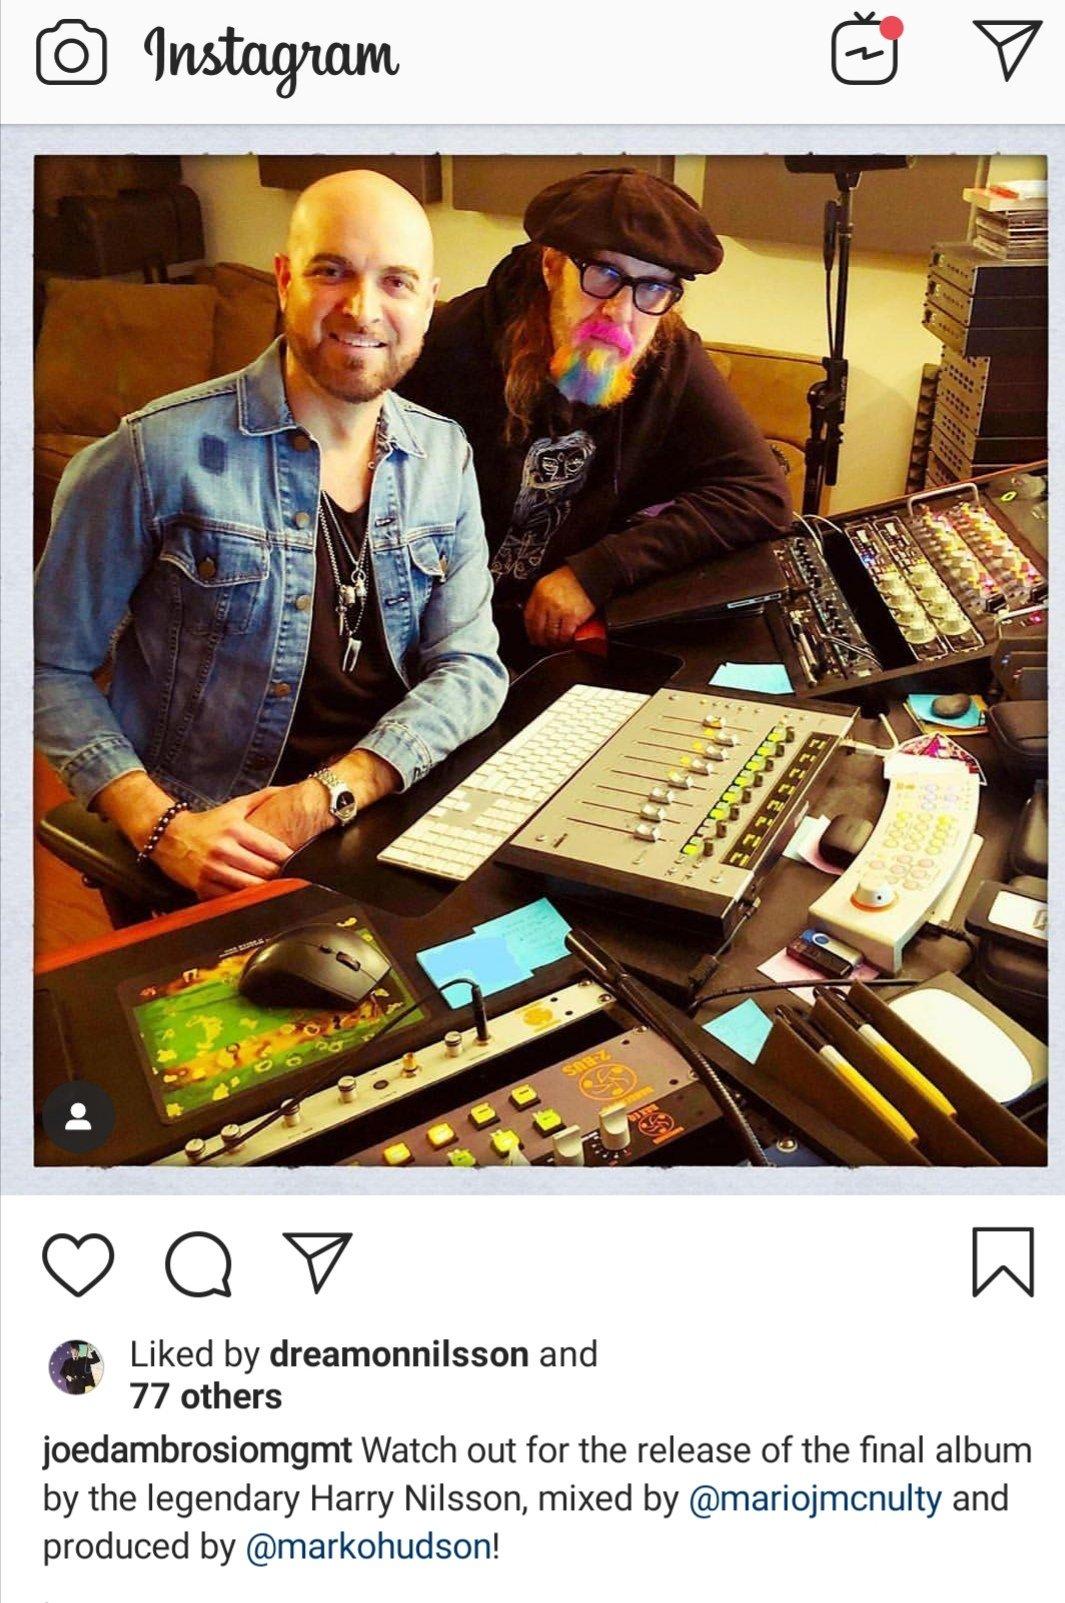 Harry Nilsson's Unreleased Final Album Announced | Steve